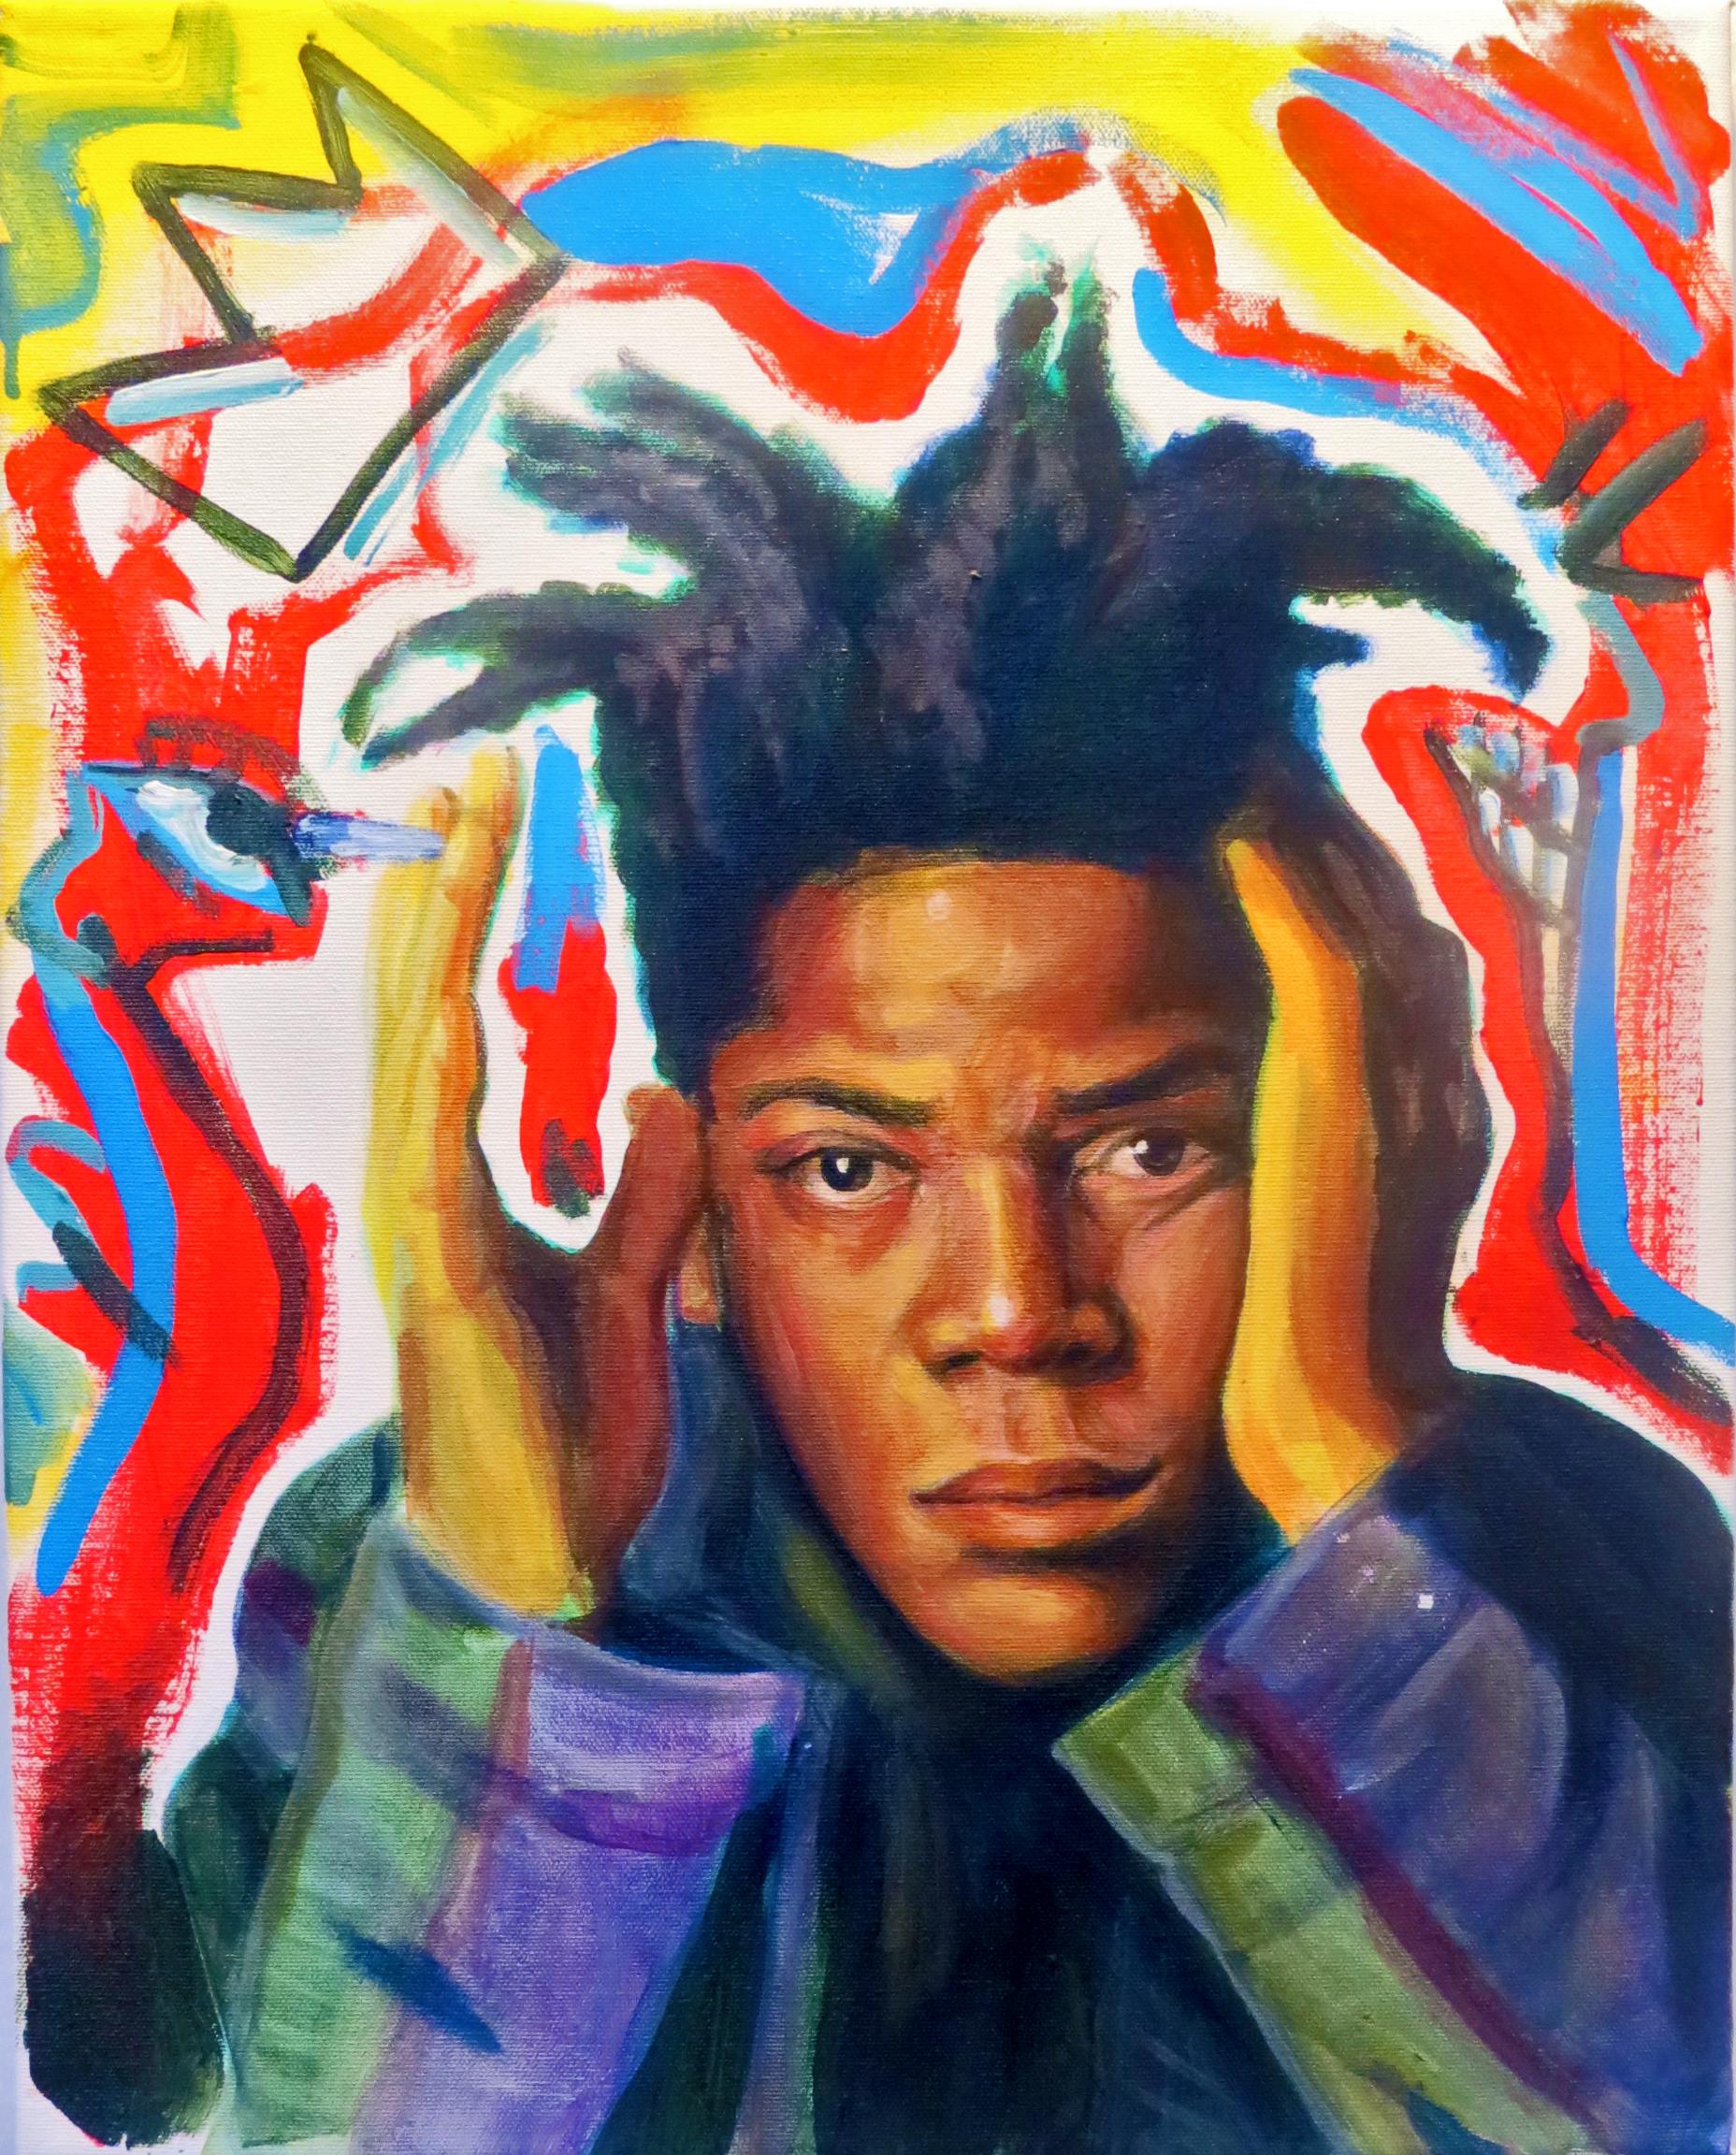 Basquiat, The Radiant Child